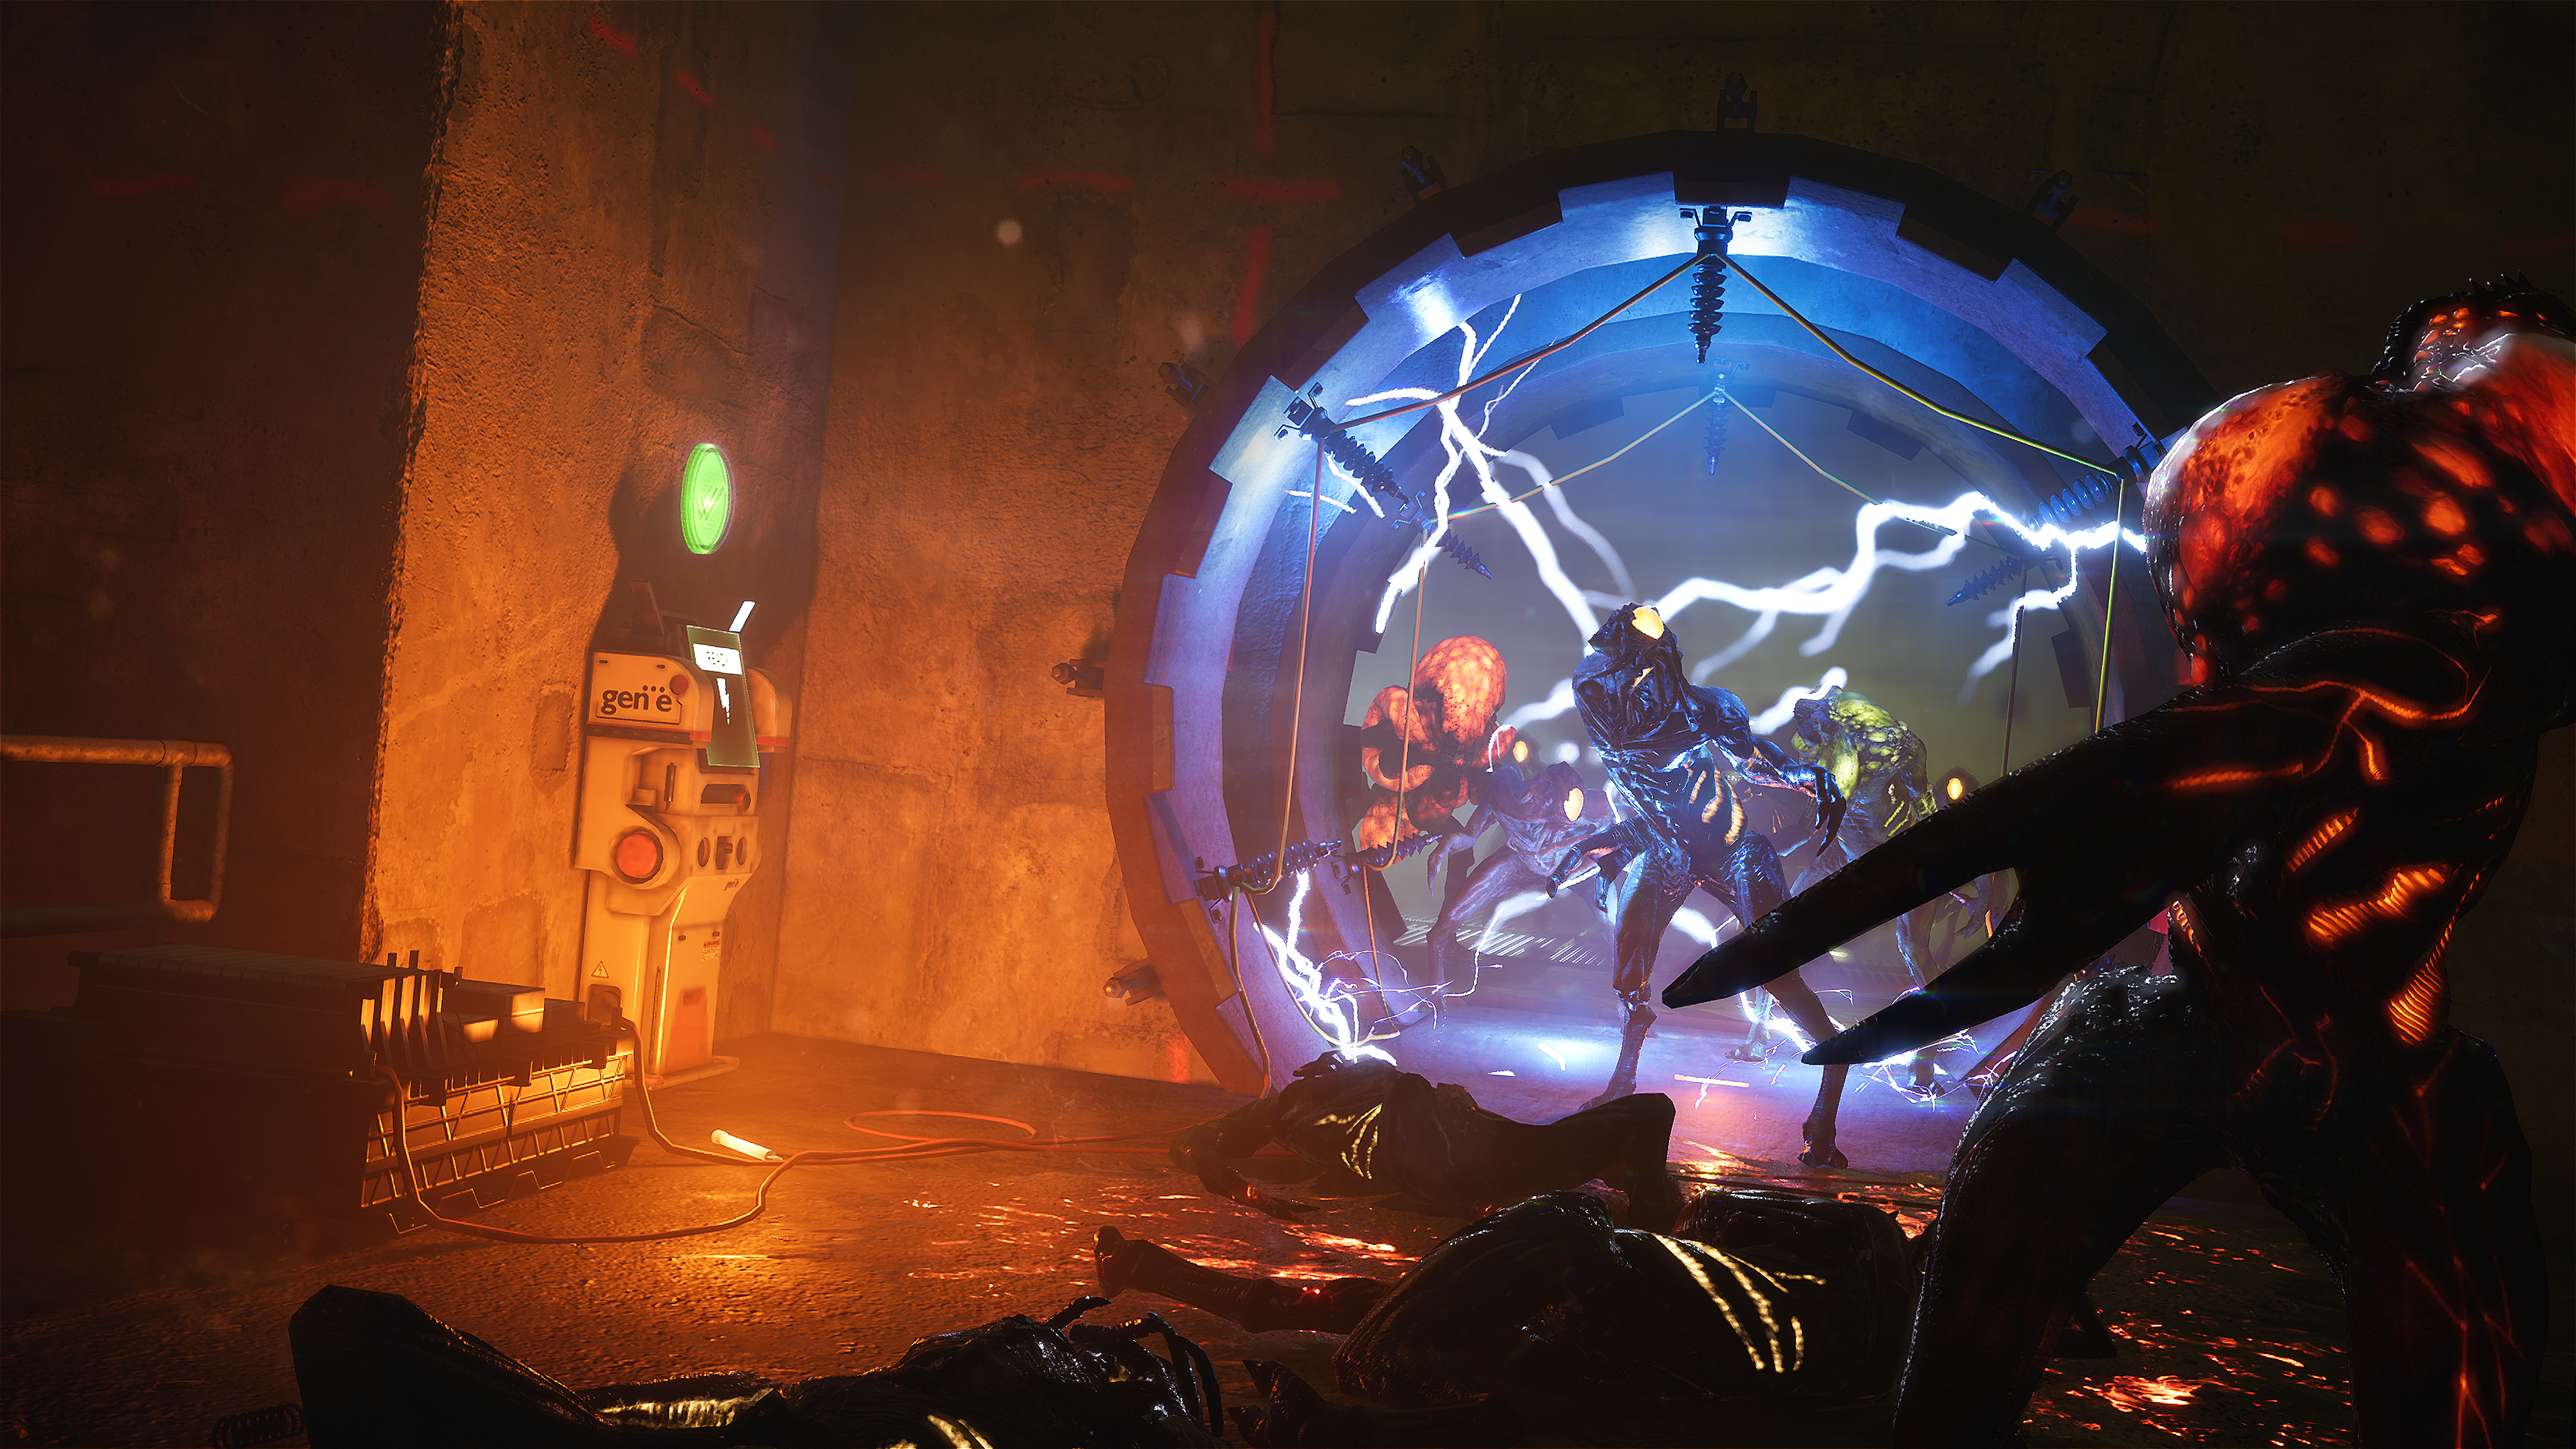 new-trailer2-earthfall-invasion-update-launch-date-announced-frikigamers.com.jpg